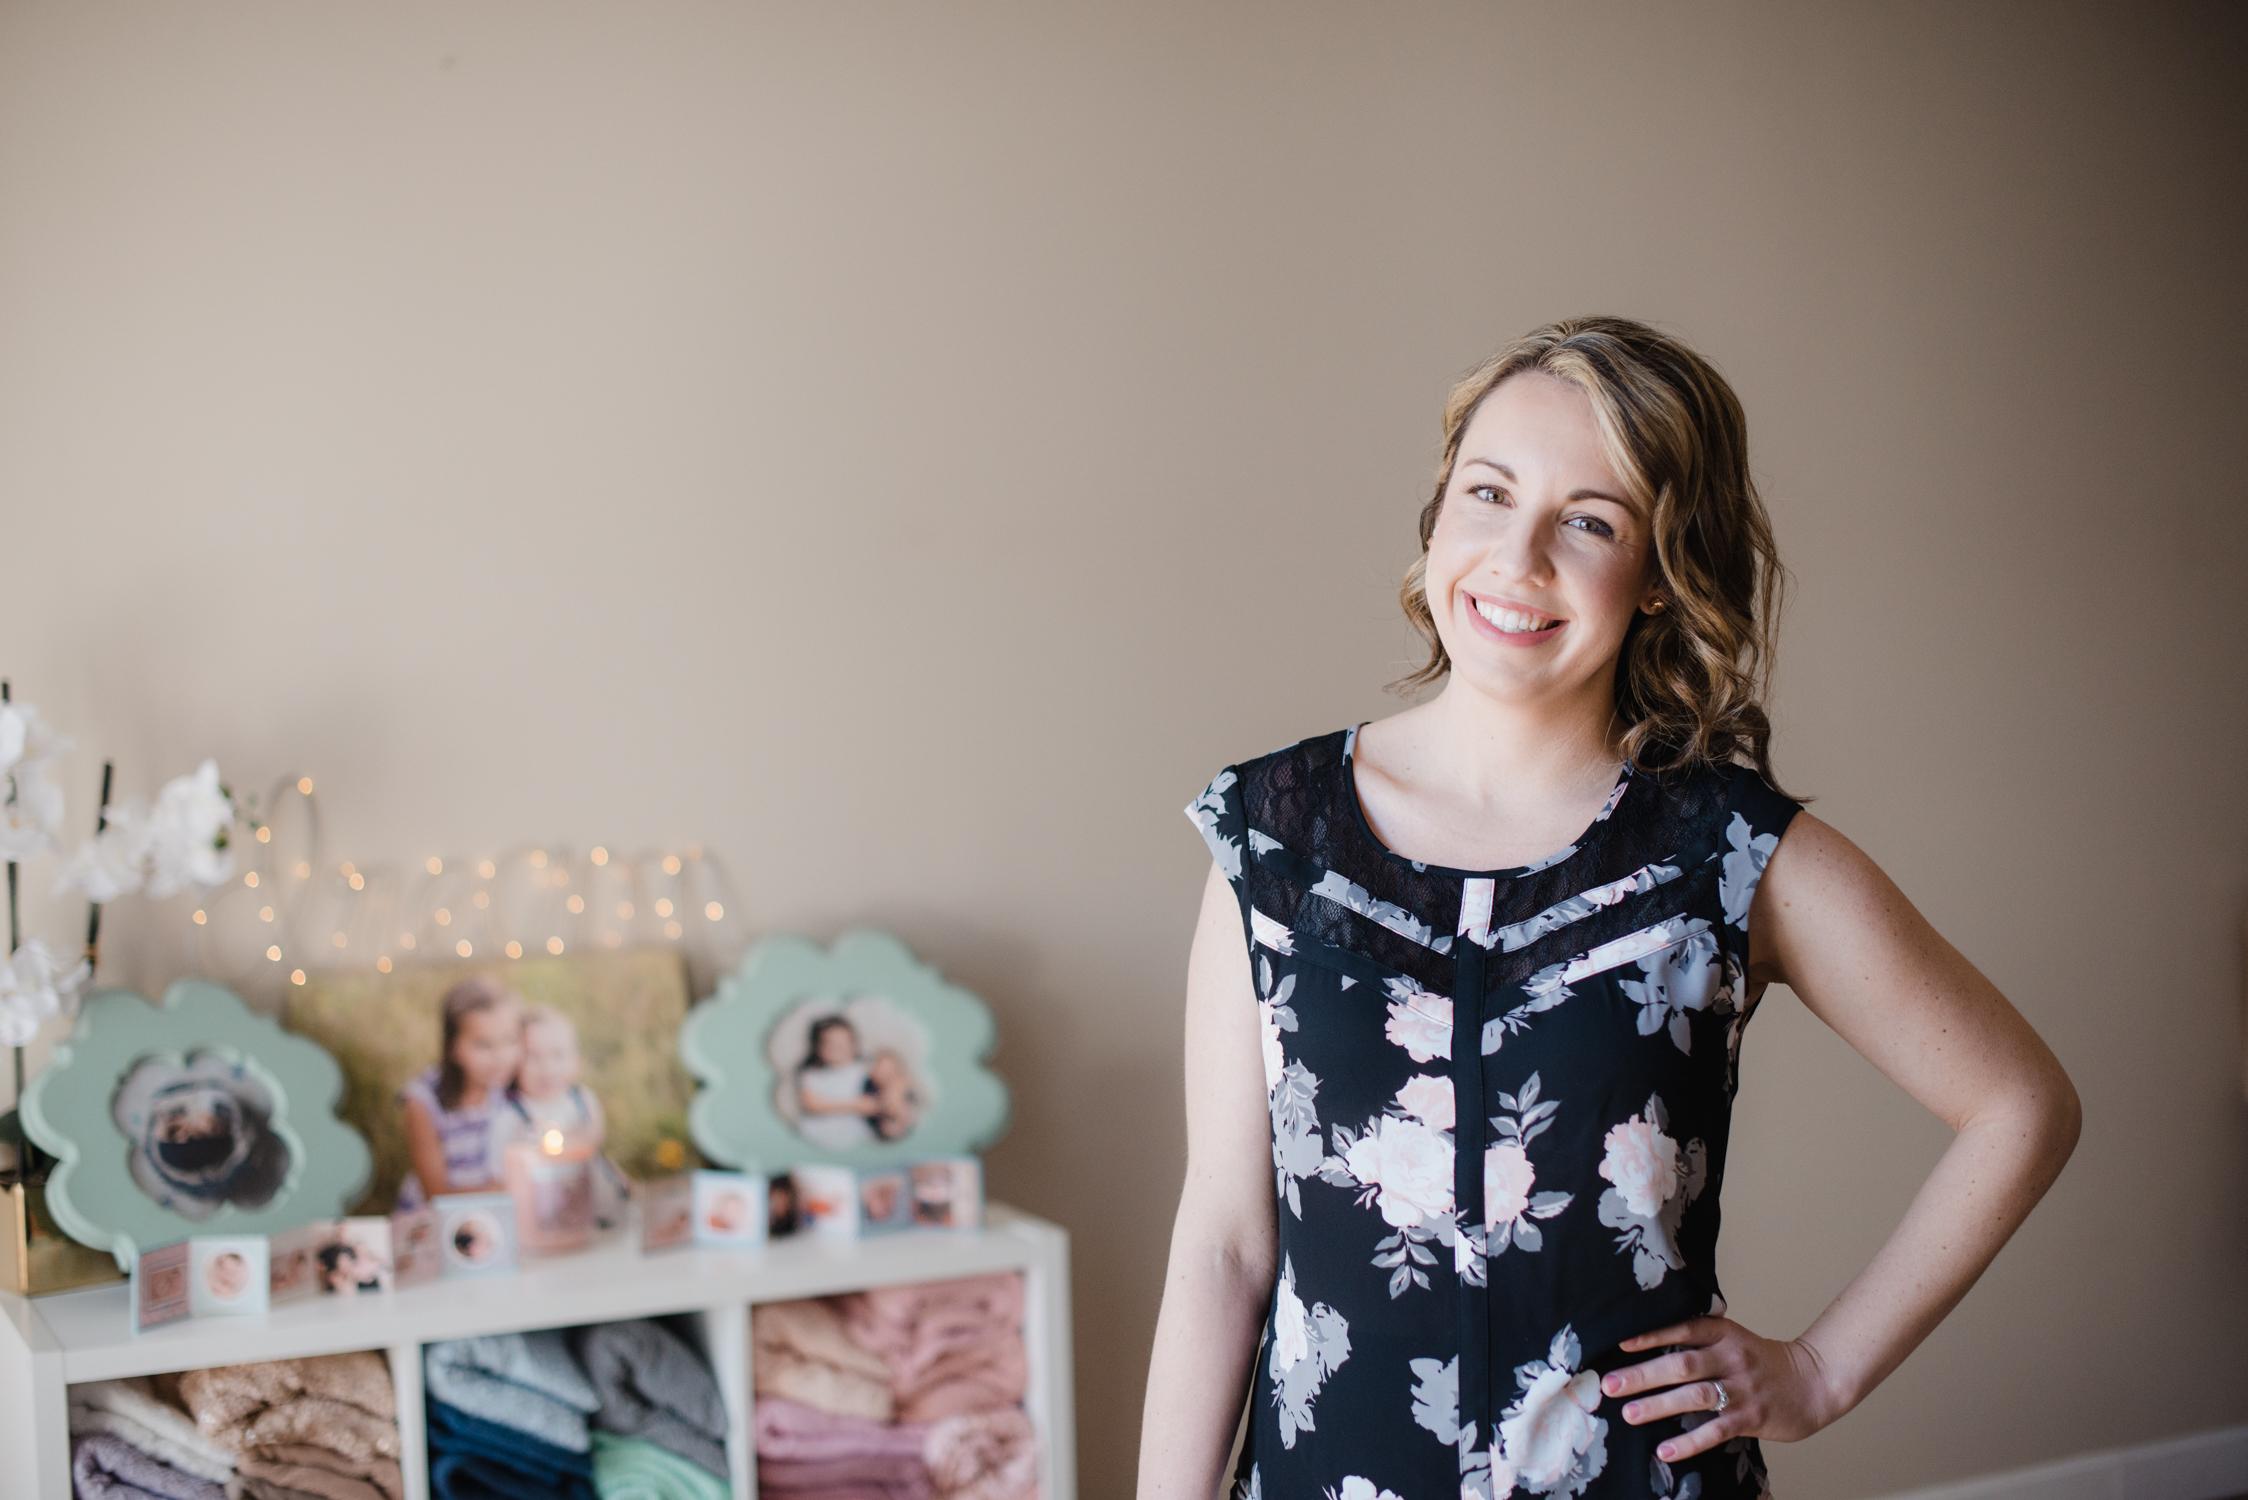 Linsey Wakefield Photography-  newborn family photographer South Shore Massachusetts and Rhode Island,  creative branding headshot by Ria MacKenzie Photography-12.jpg